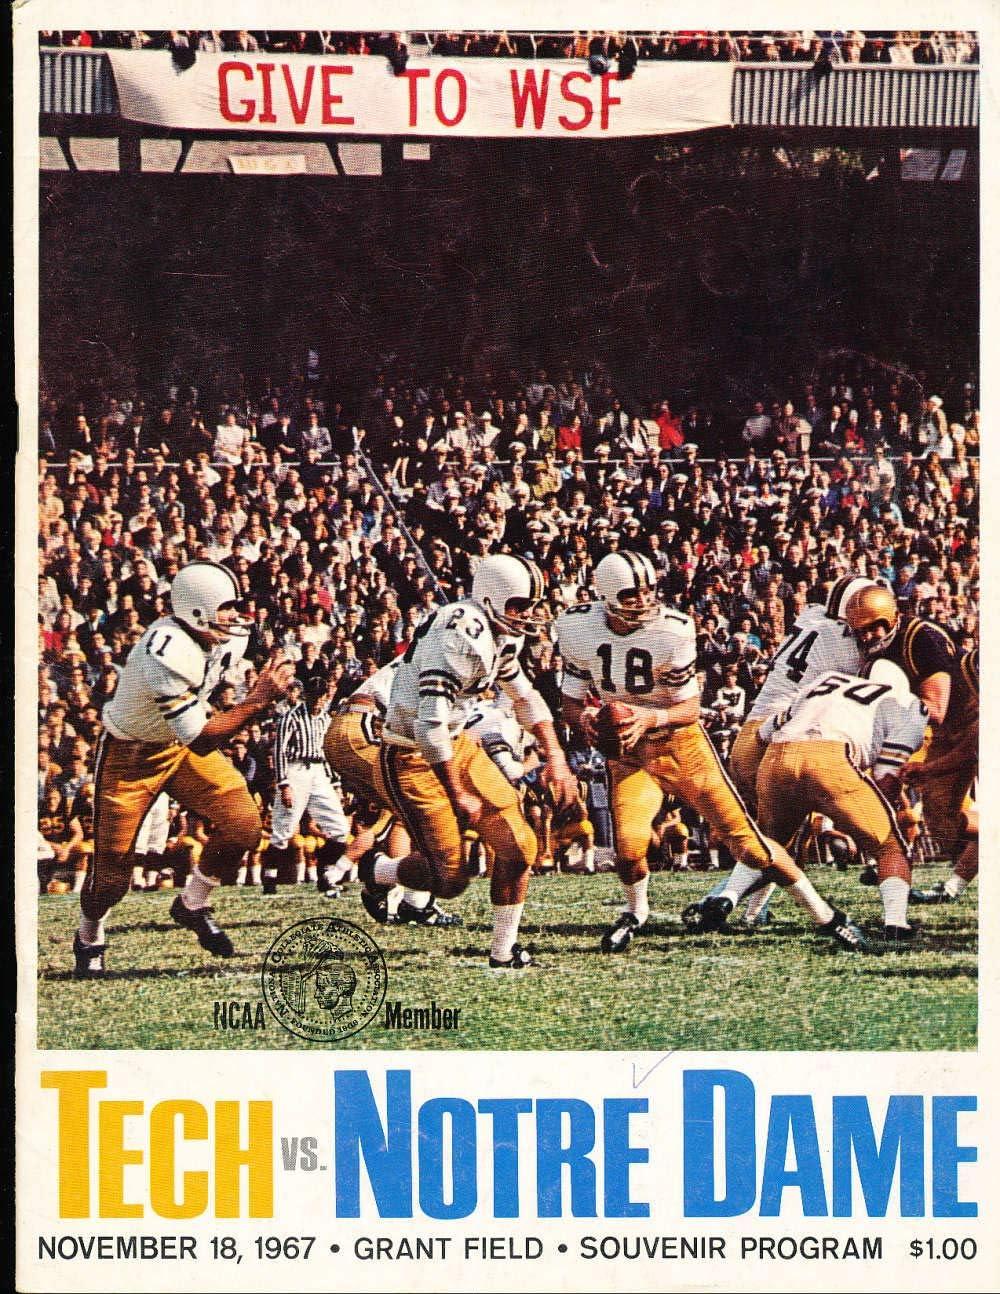 Amazon Com 11 18 1967 Notre Dame Vs Georgia Tech Football Program Bx26 A6 Sports Collectibles